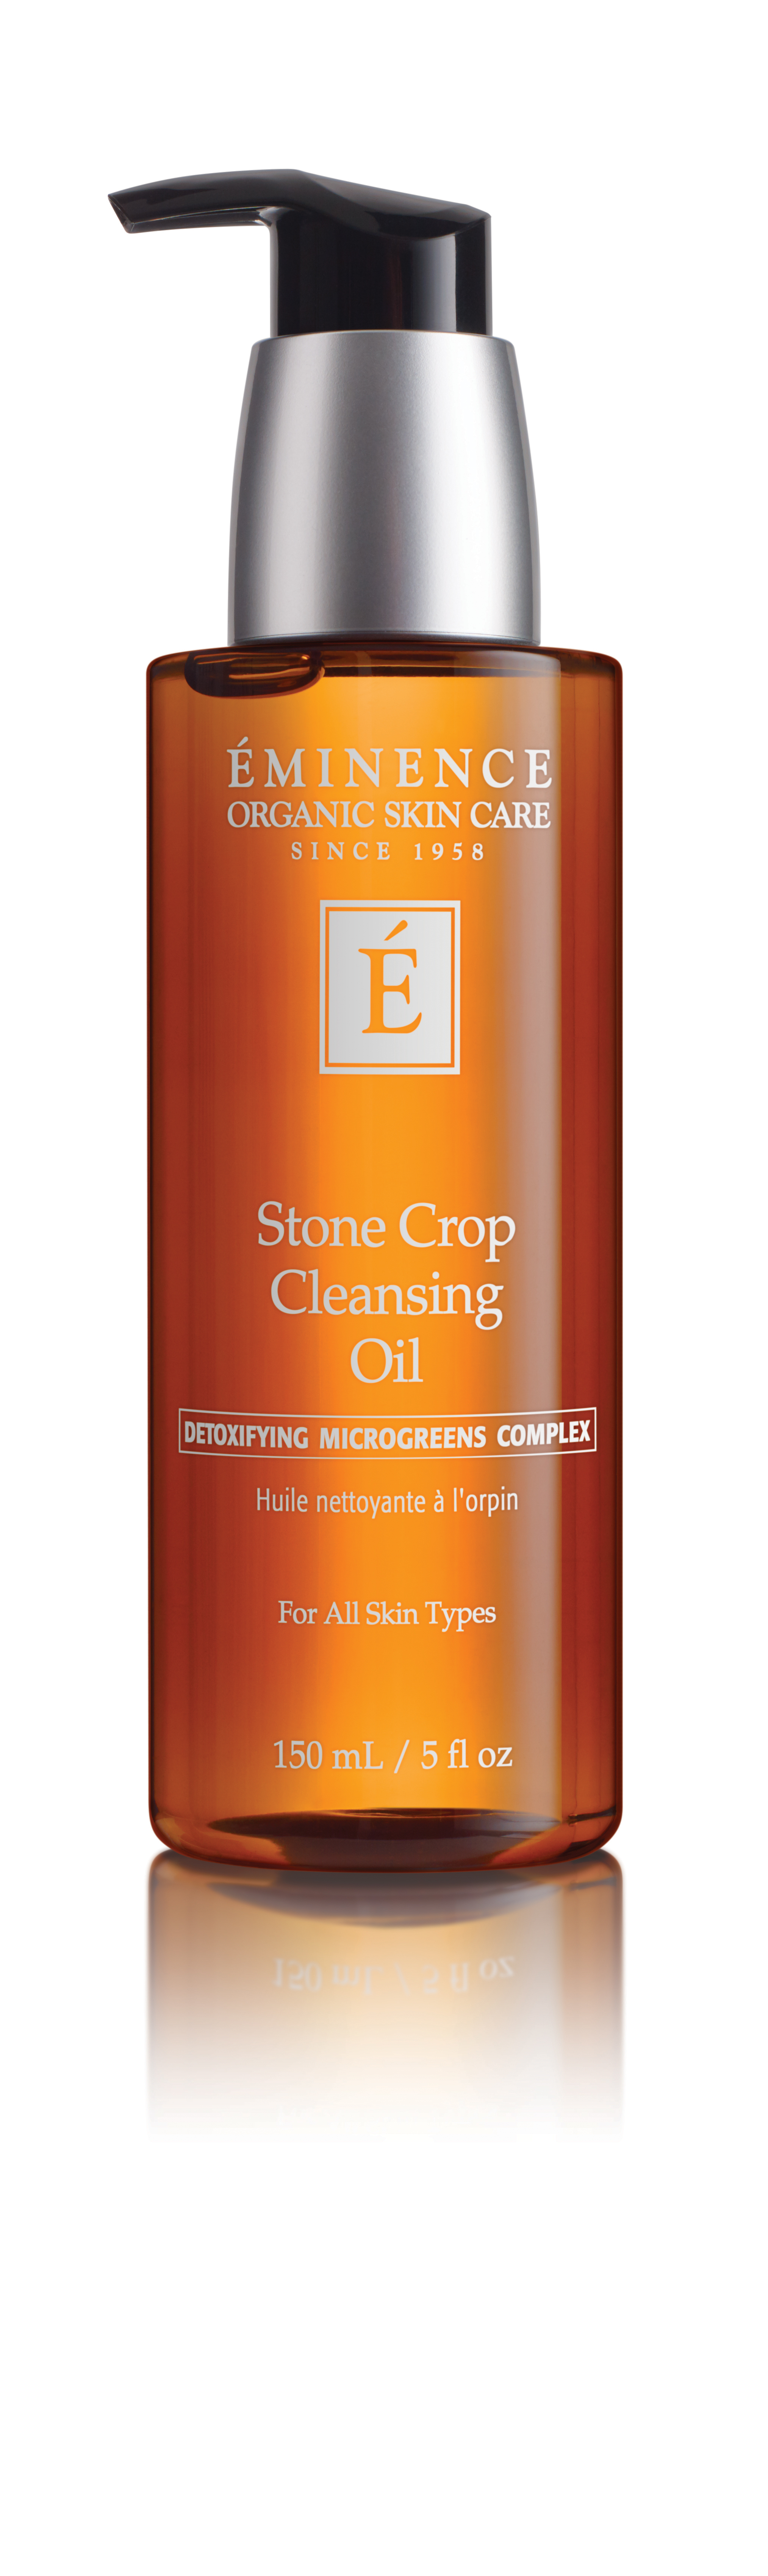 eminence-organics-stonecrop-cleansing-oil_0.jpg